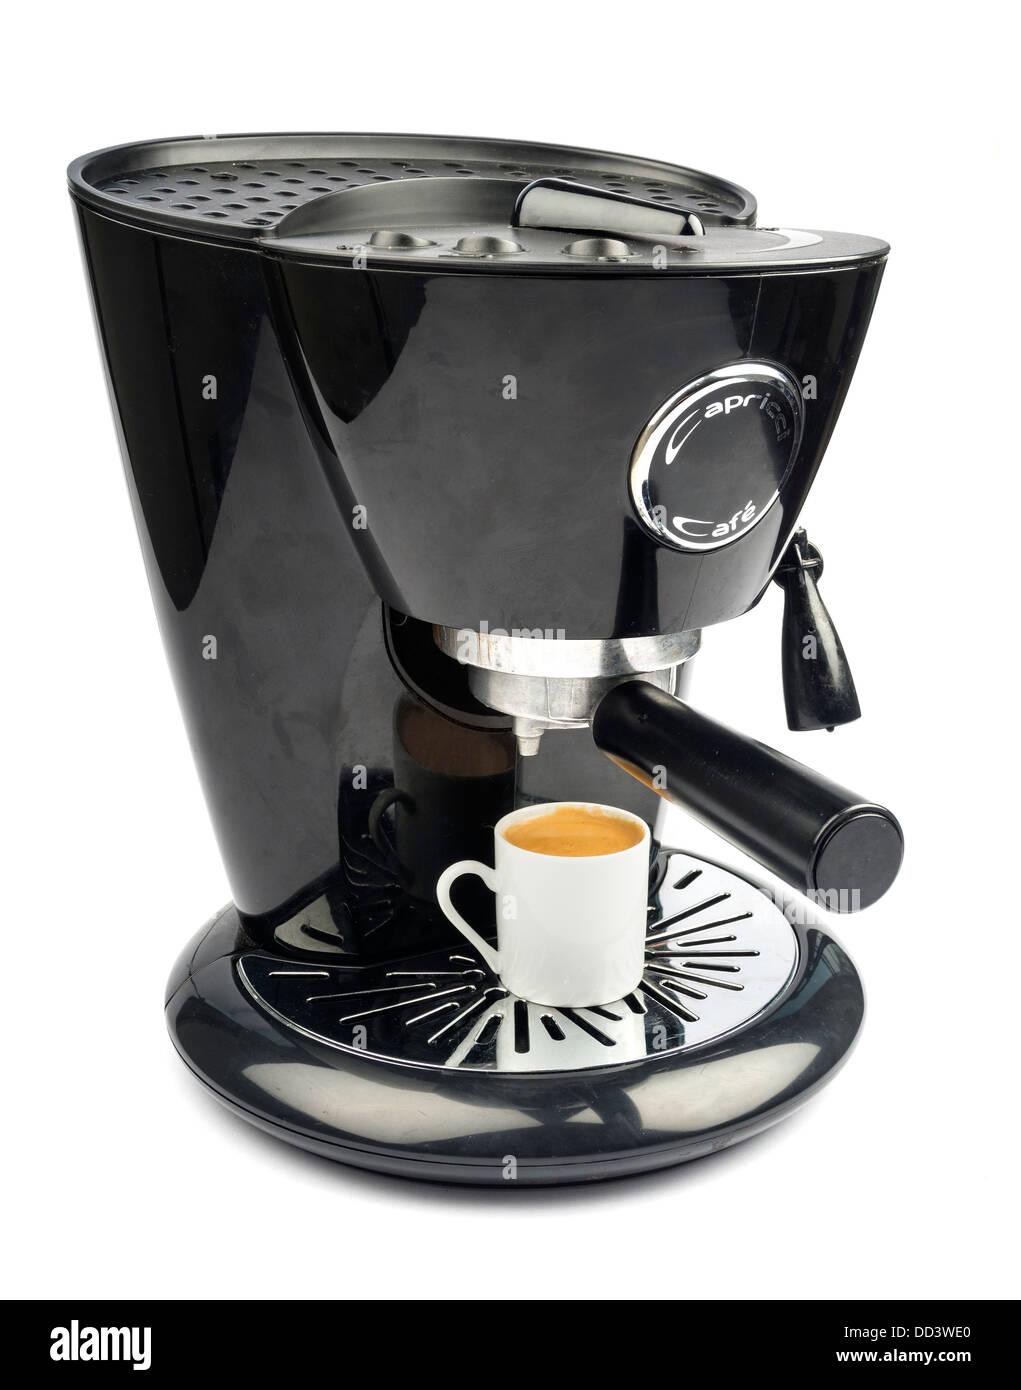 Negro espresso cafetera eléctrica aislada sobre fondo blanco. Imagen De Stock